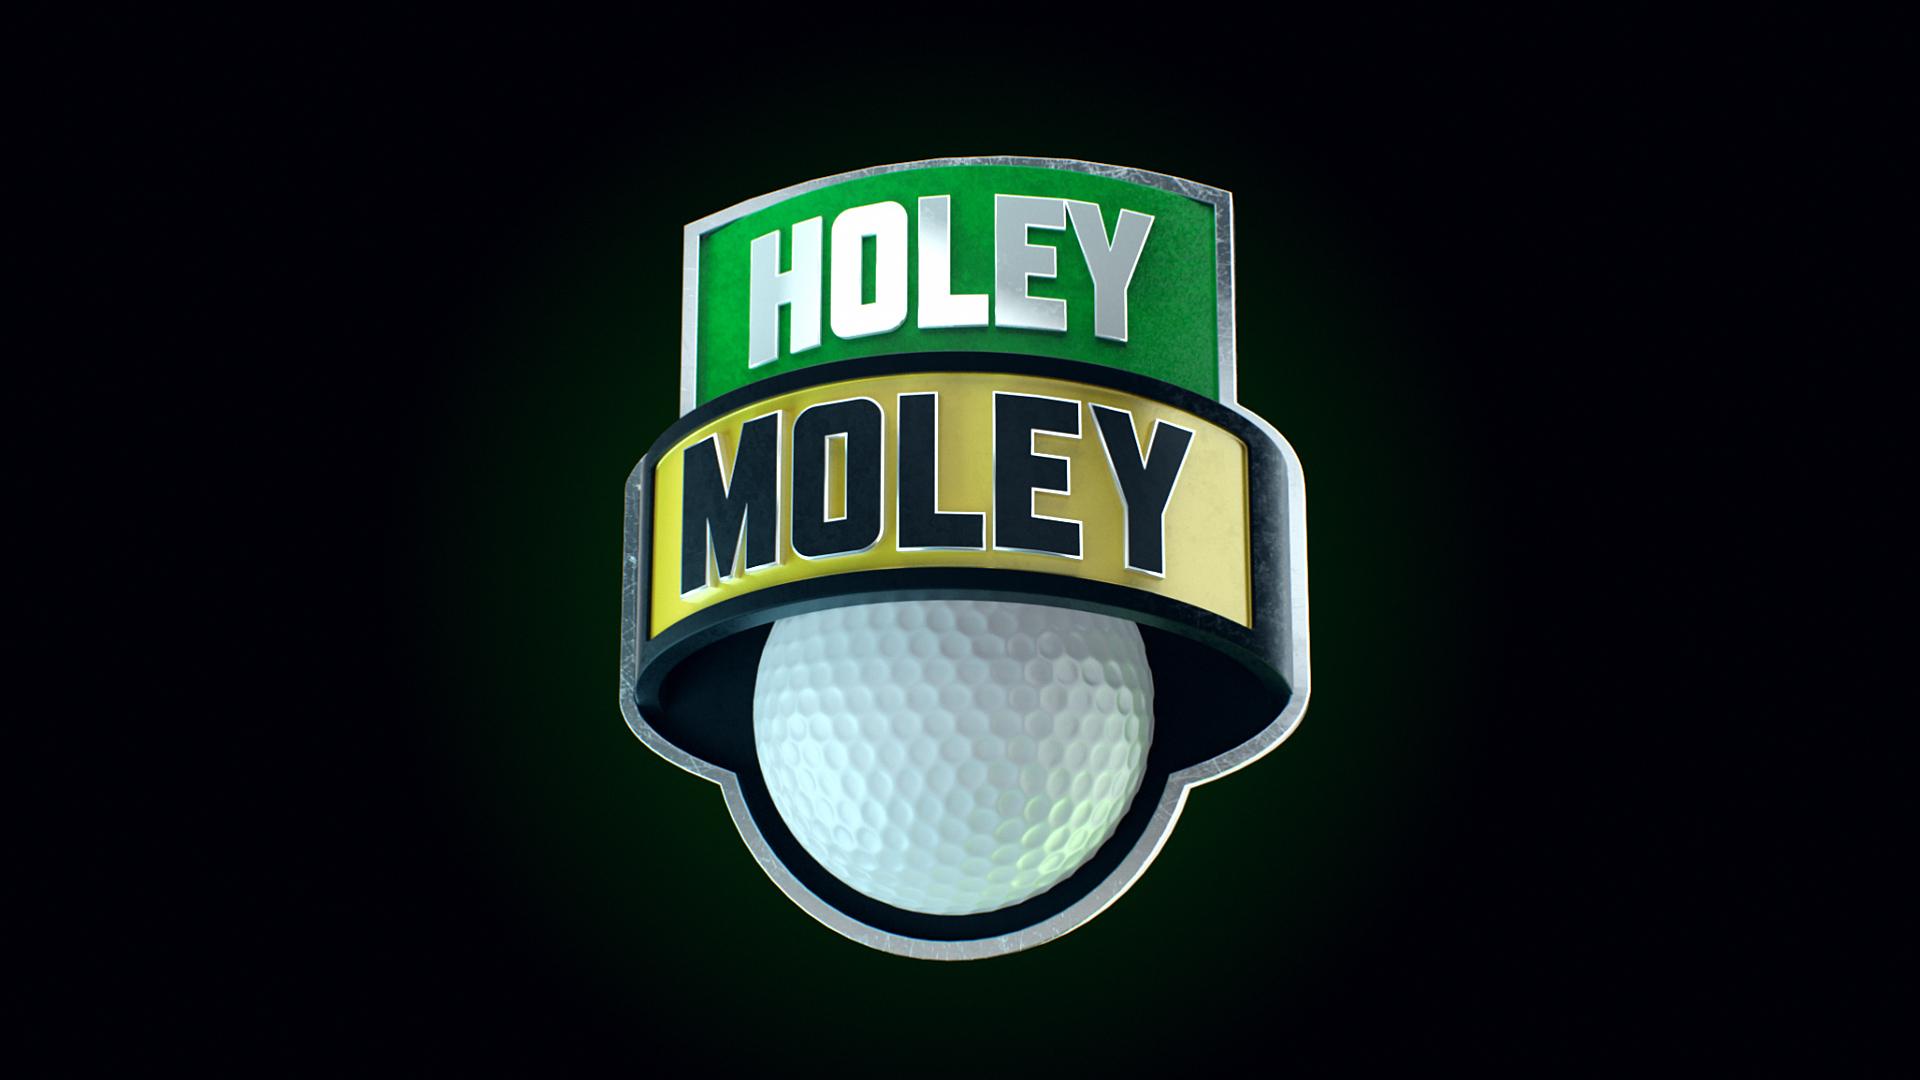 holey2_0005 (00019).jpg